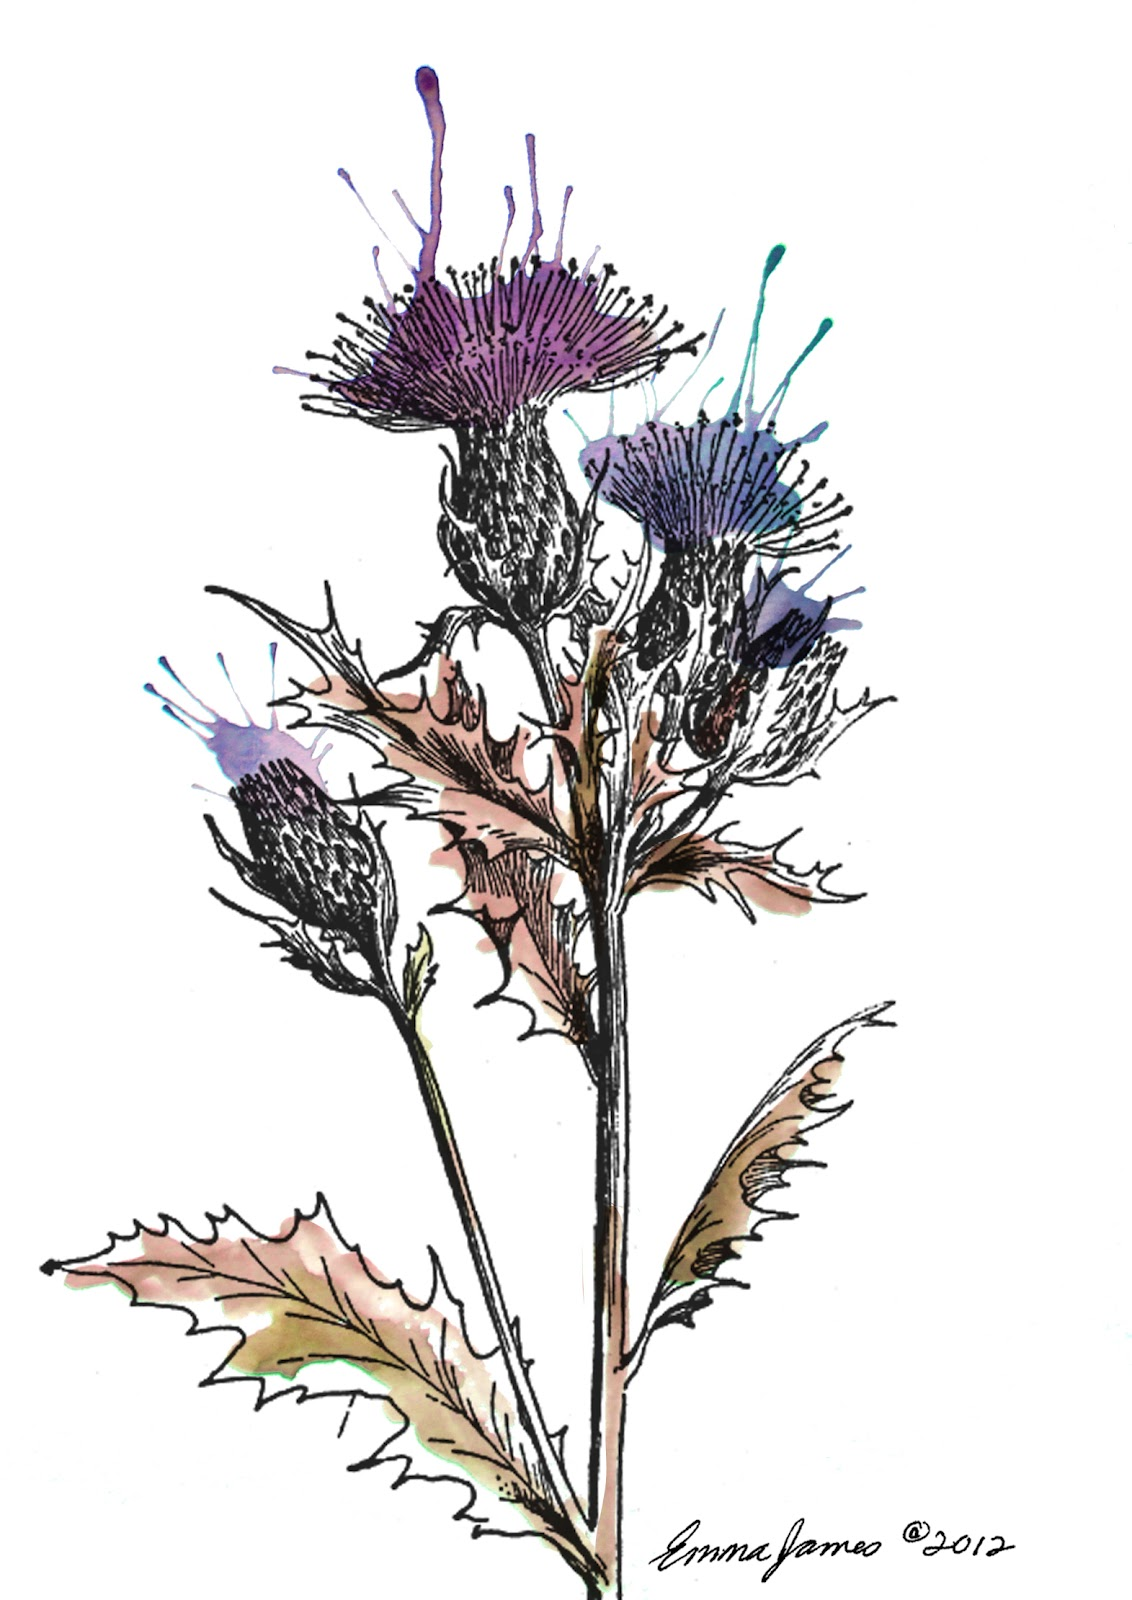 Flower of Scotland - Wikipedia